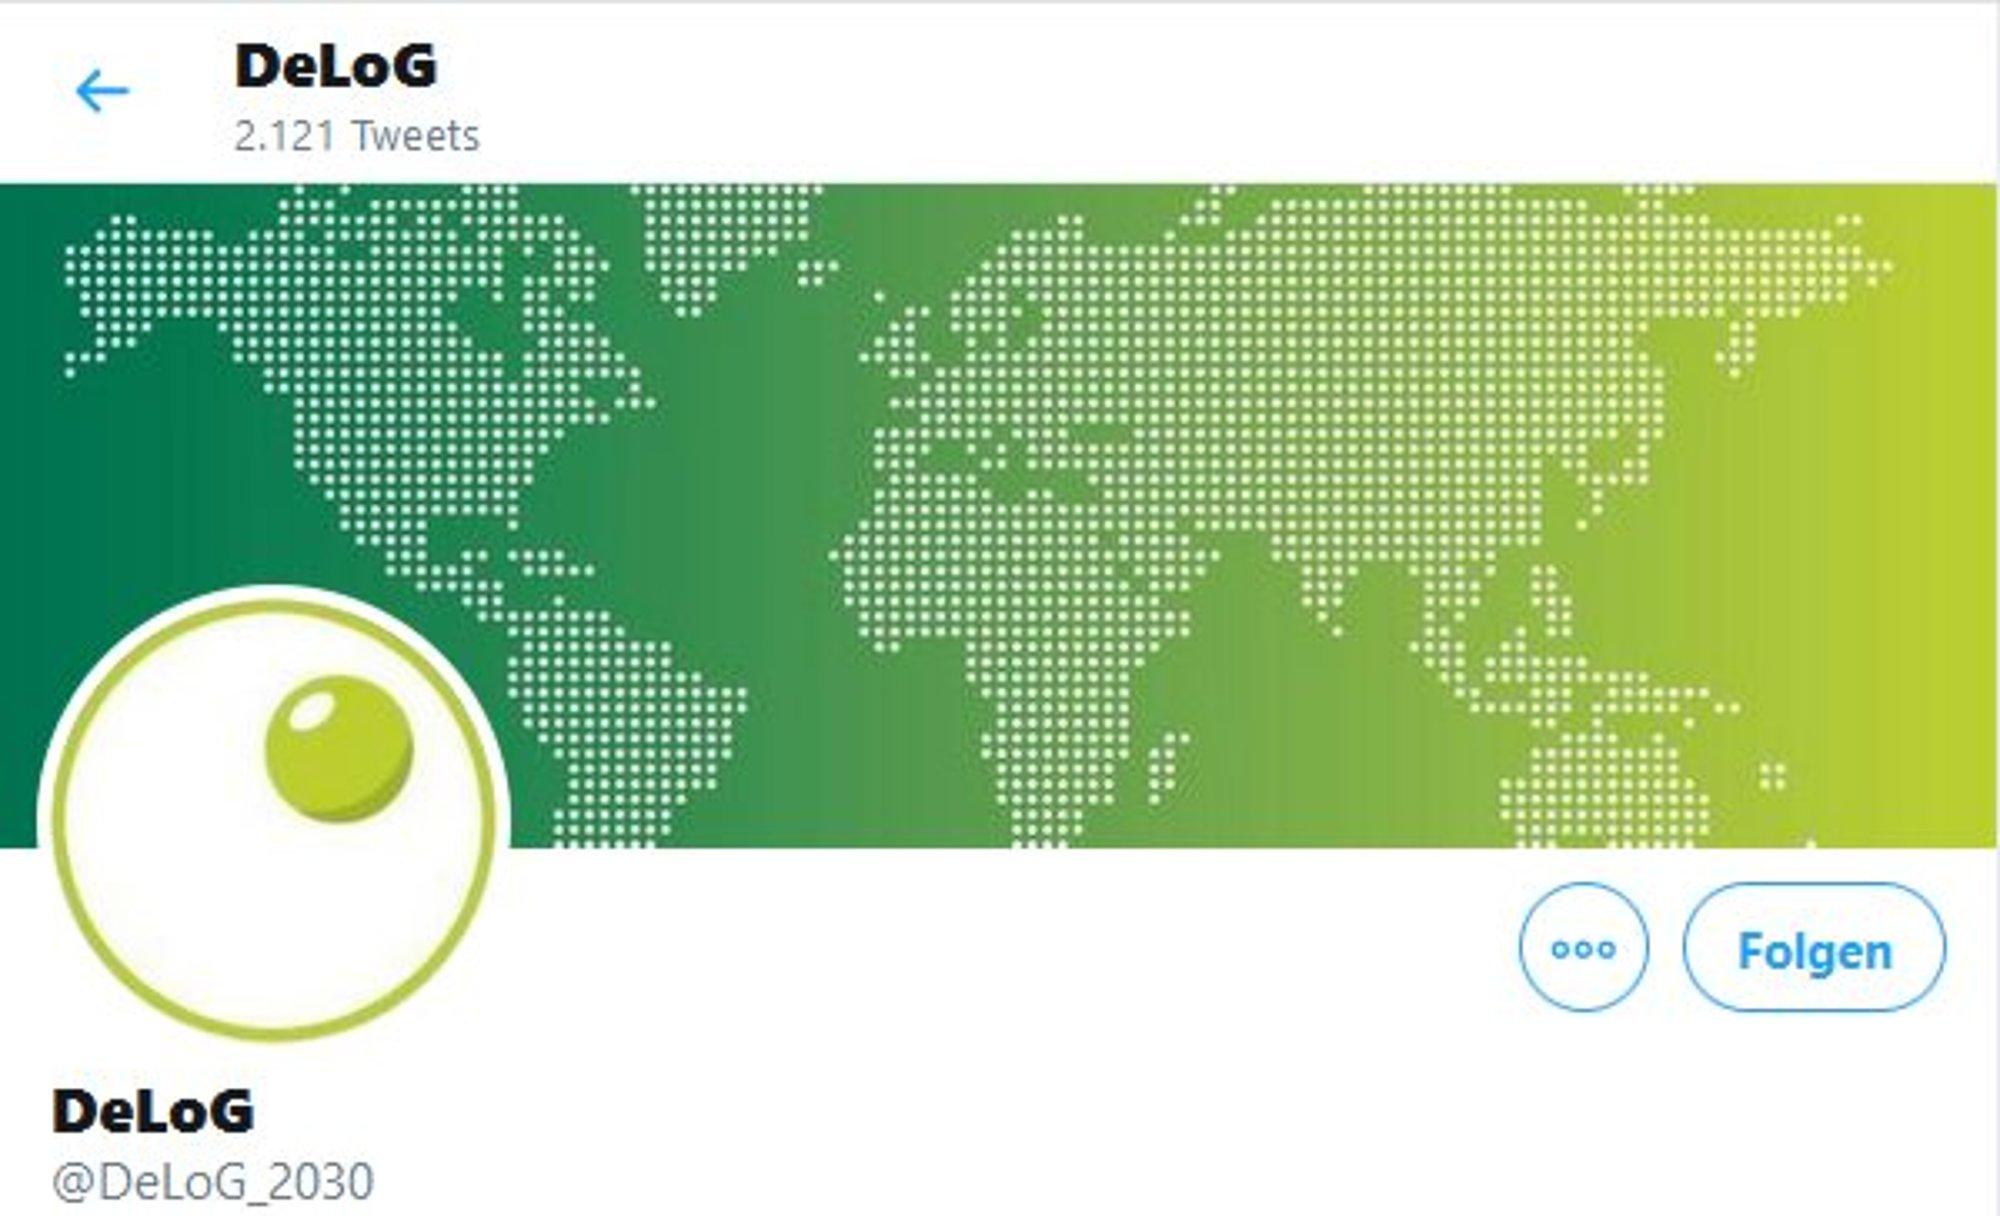 DeLog twitter account